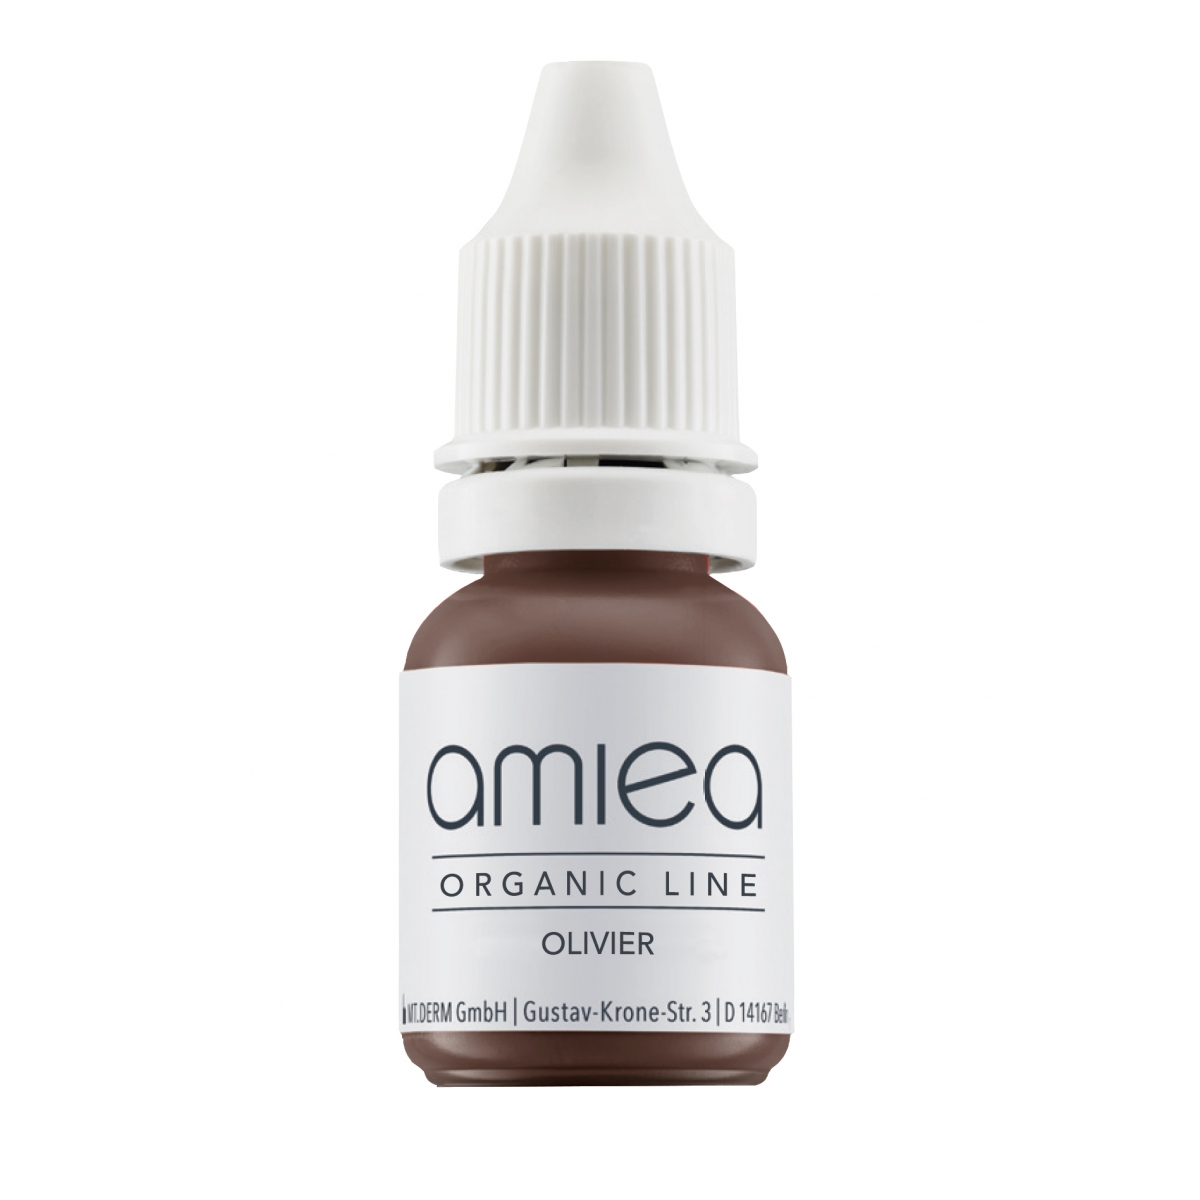 ORGANIC LINE (10ml) - PIGMENT OLIVIER ORGANICLINE AMIEA (10 ml)